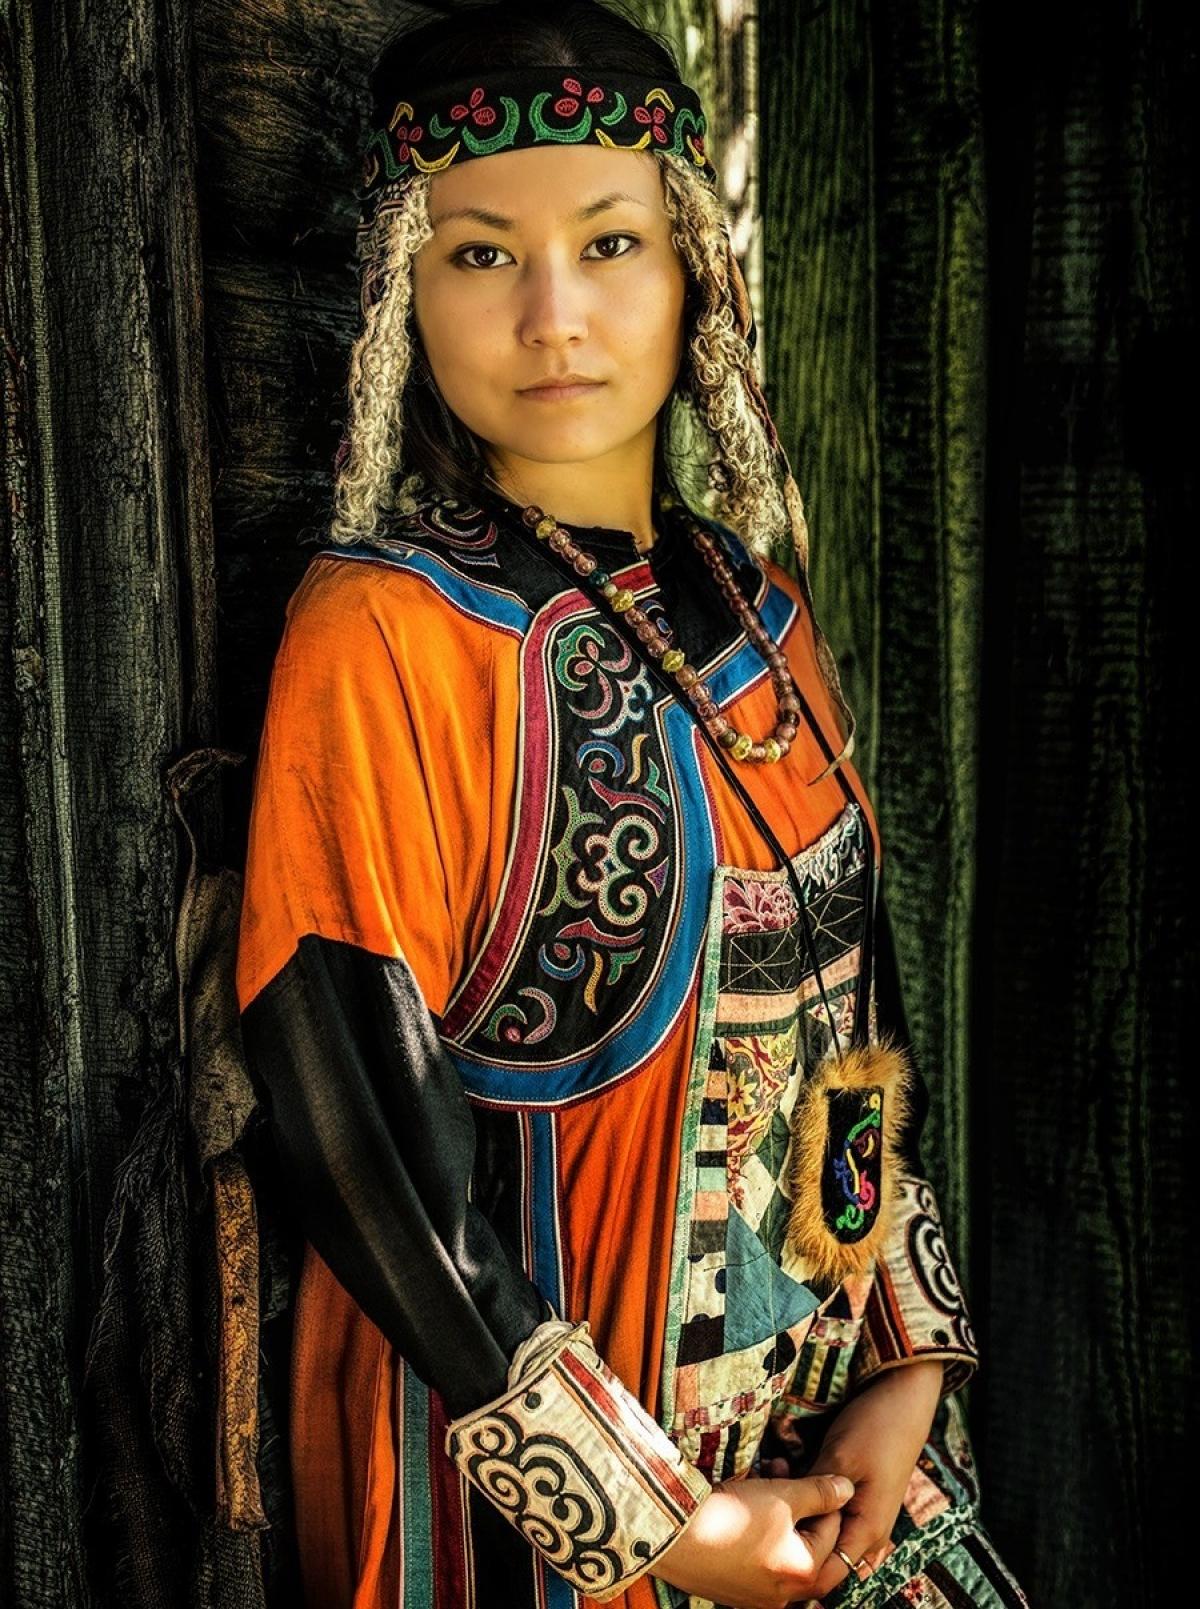 Thanh nữ Orochi.